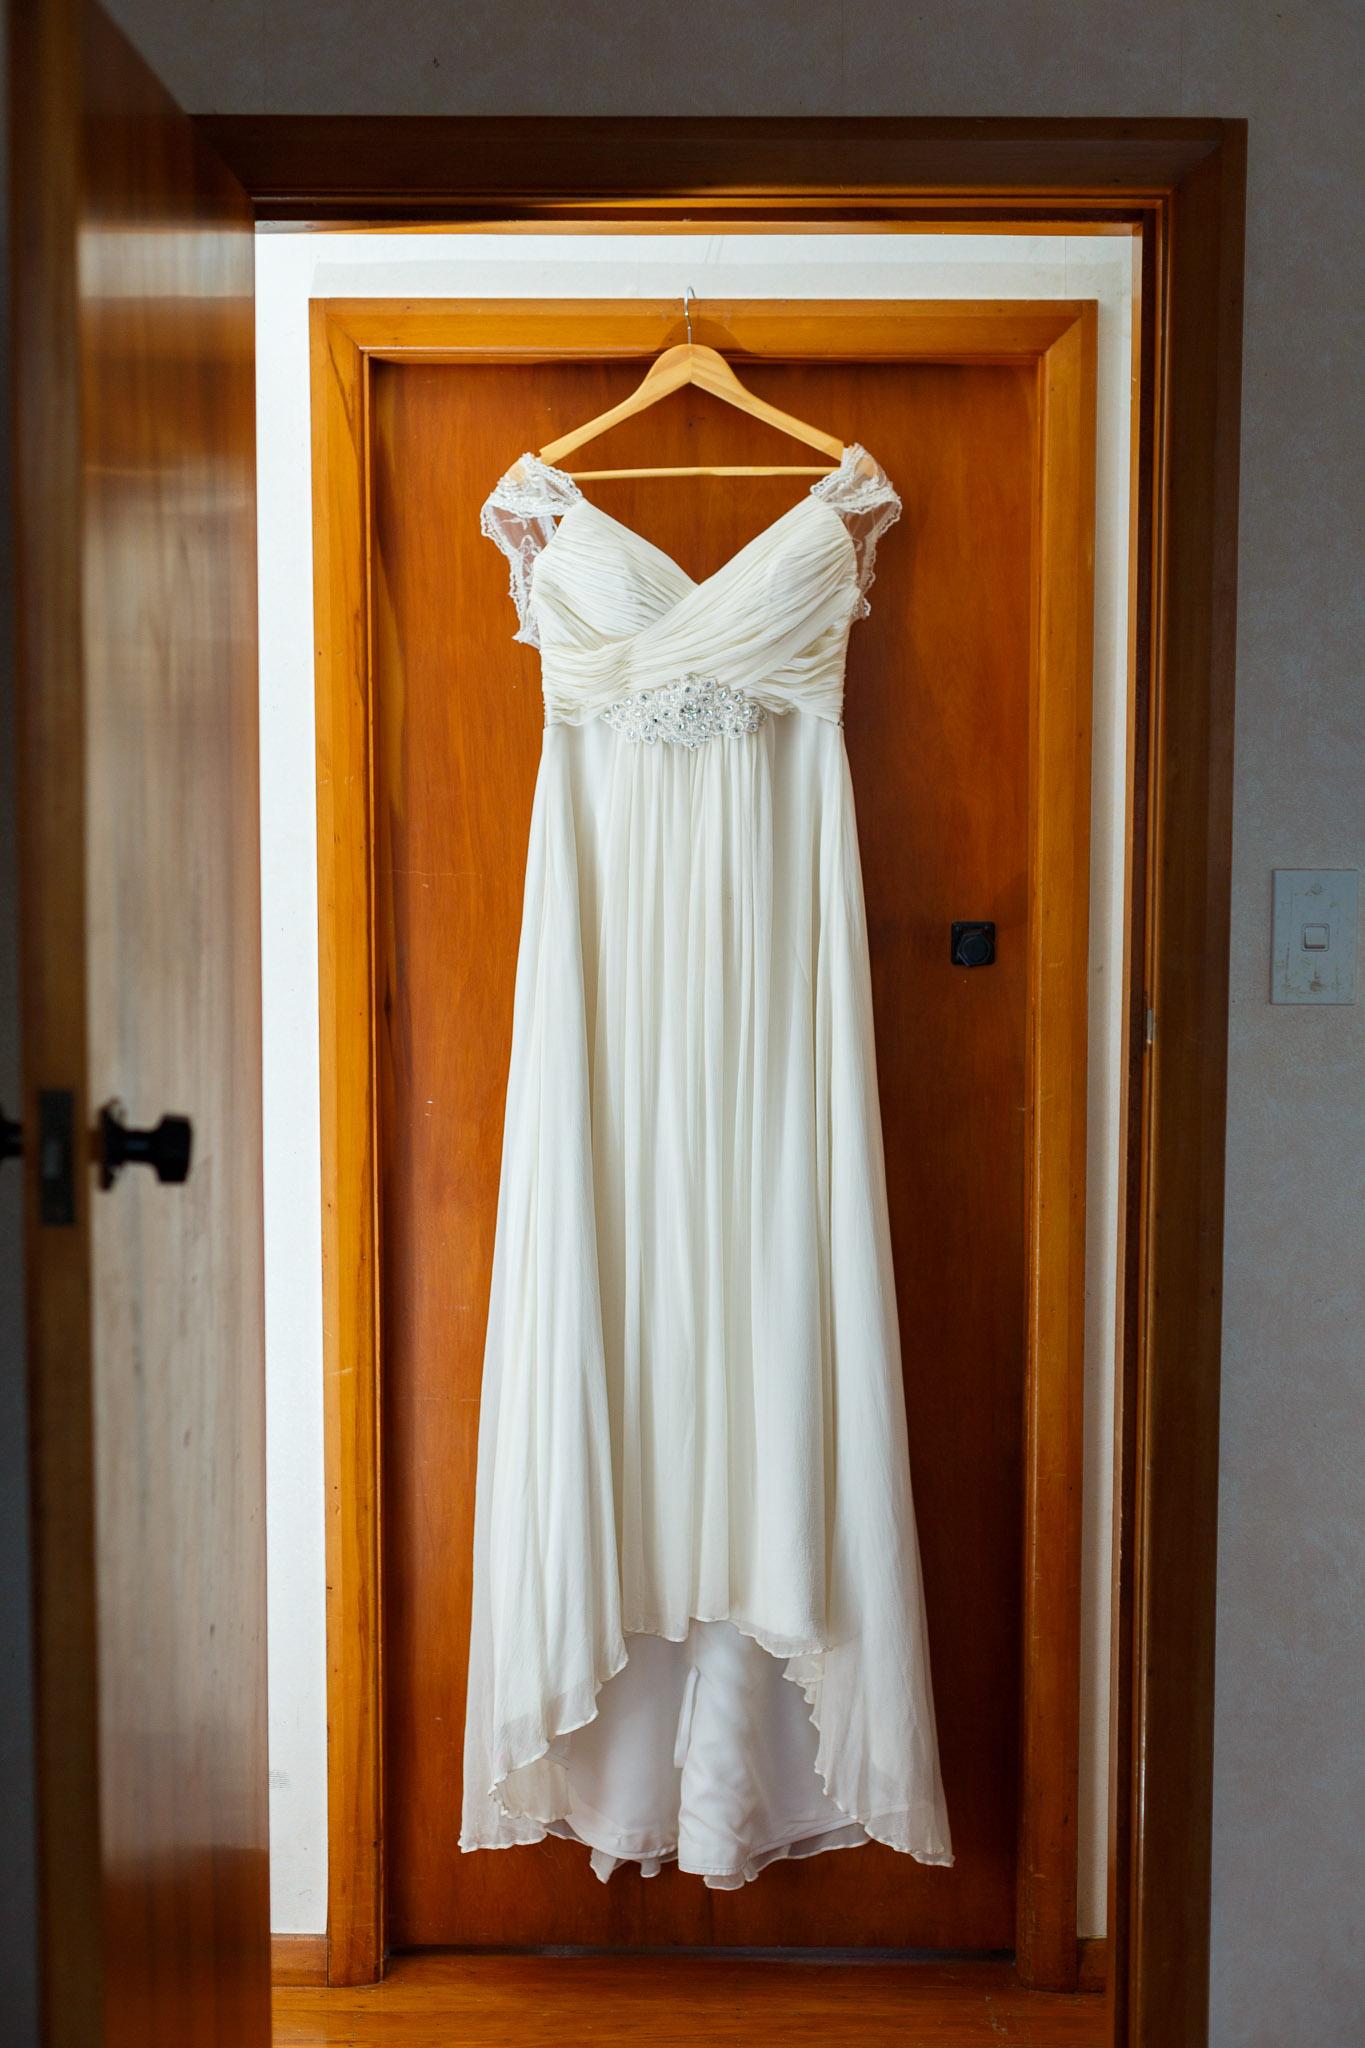 highlight_wedding_photography_manawatu_palmerston_north_new_zealand_rangitikei_golf_ohakea-10.jpg